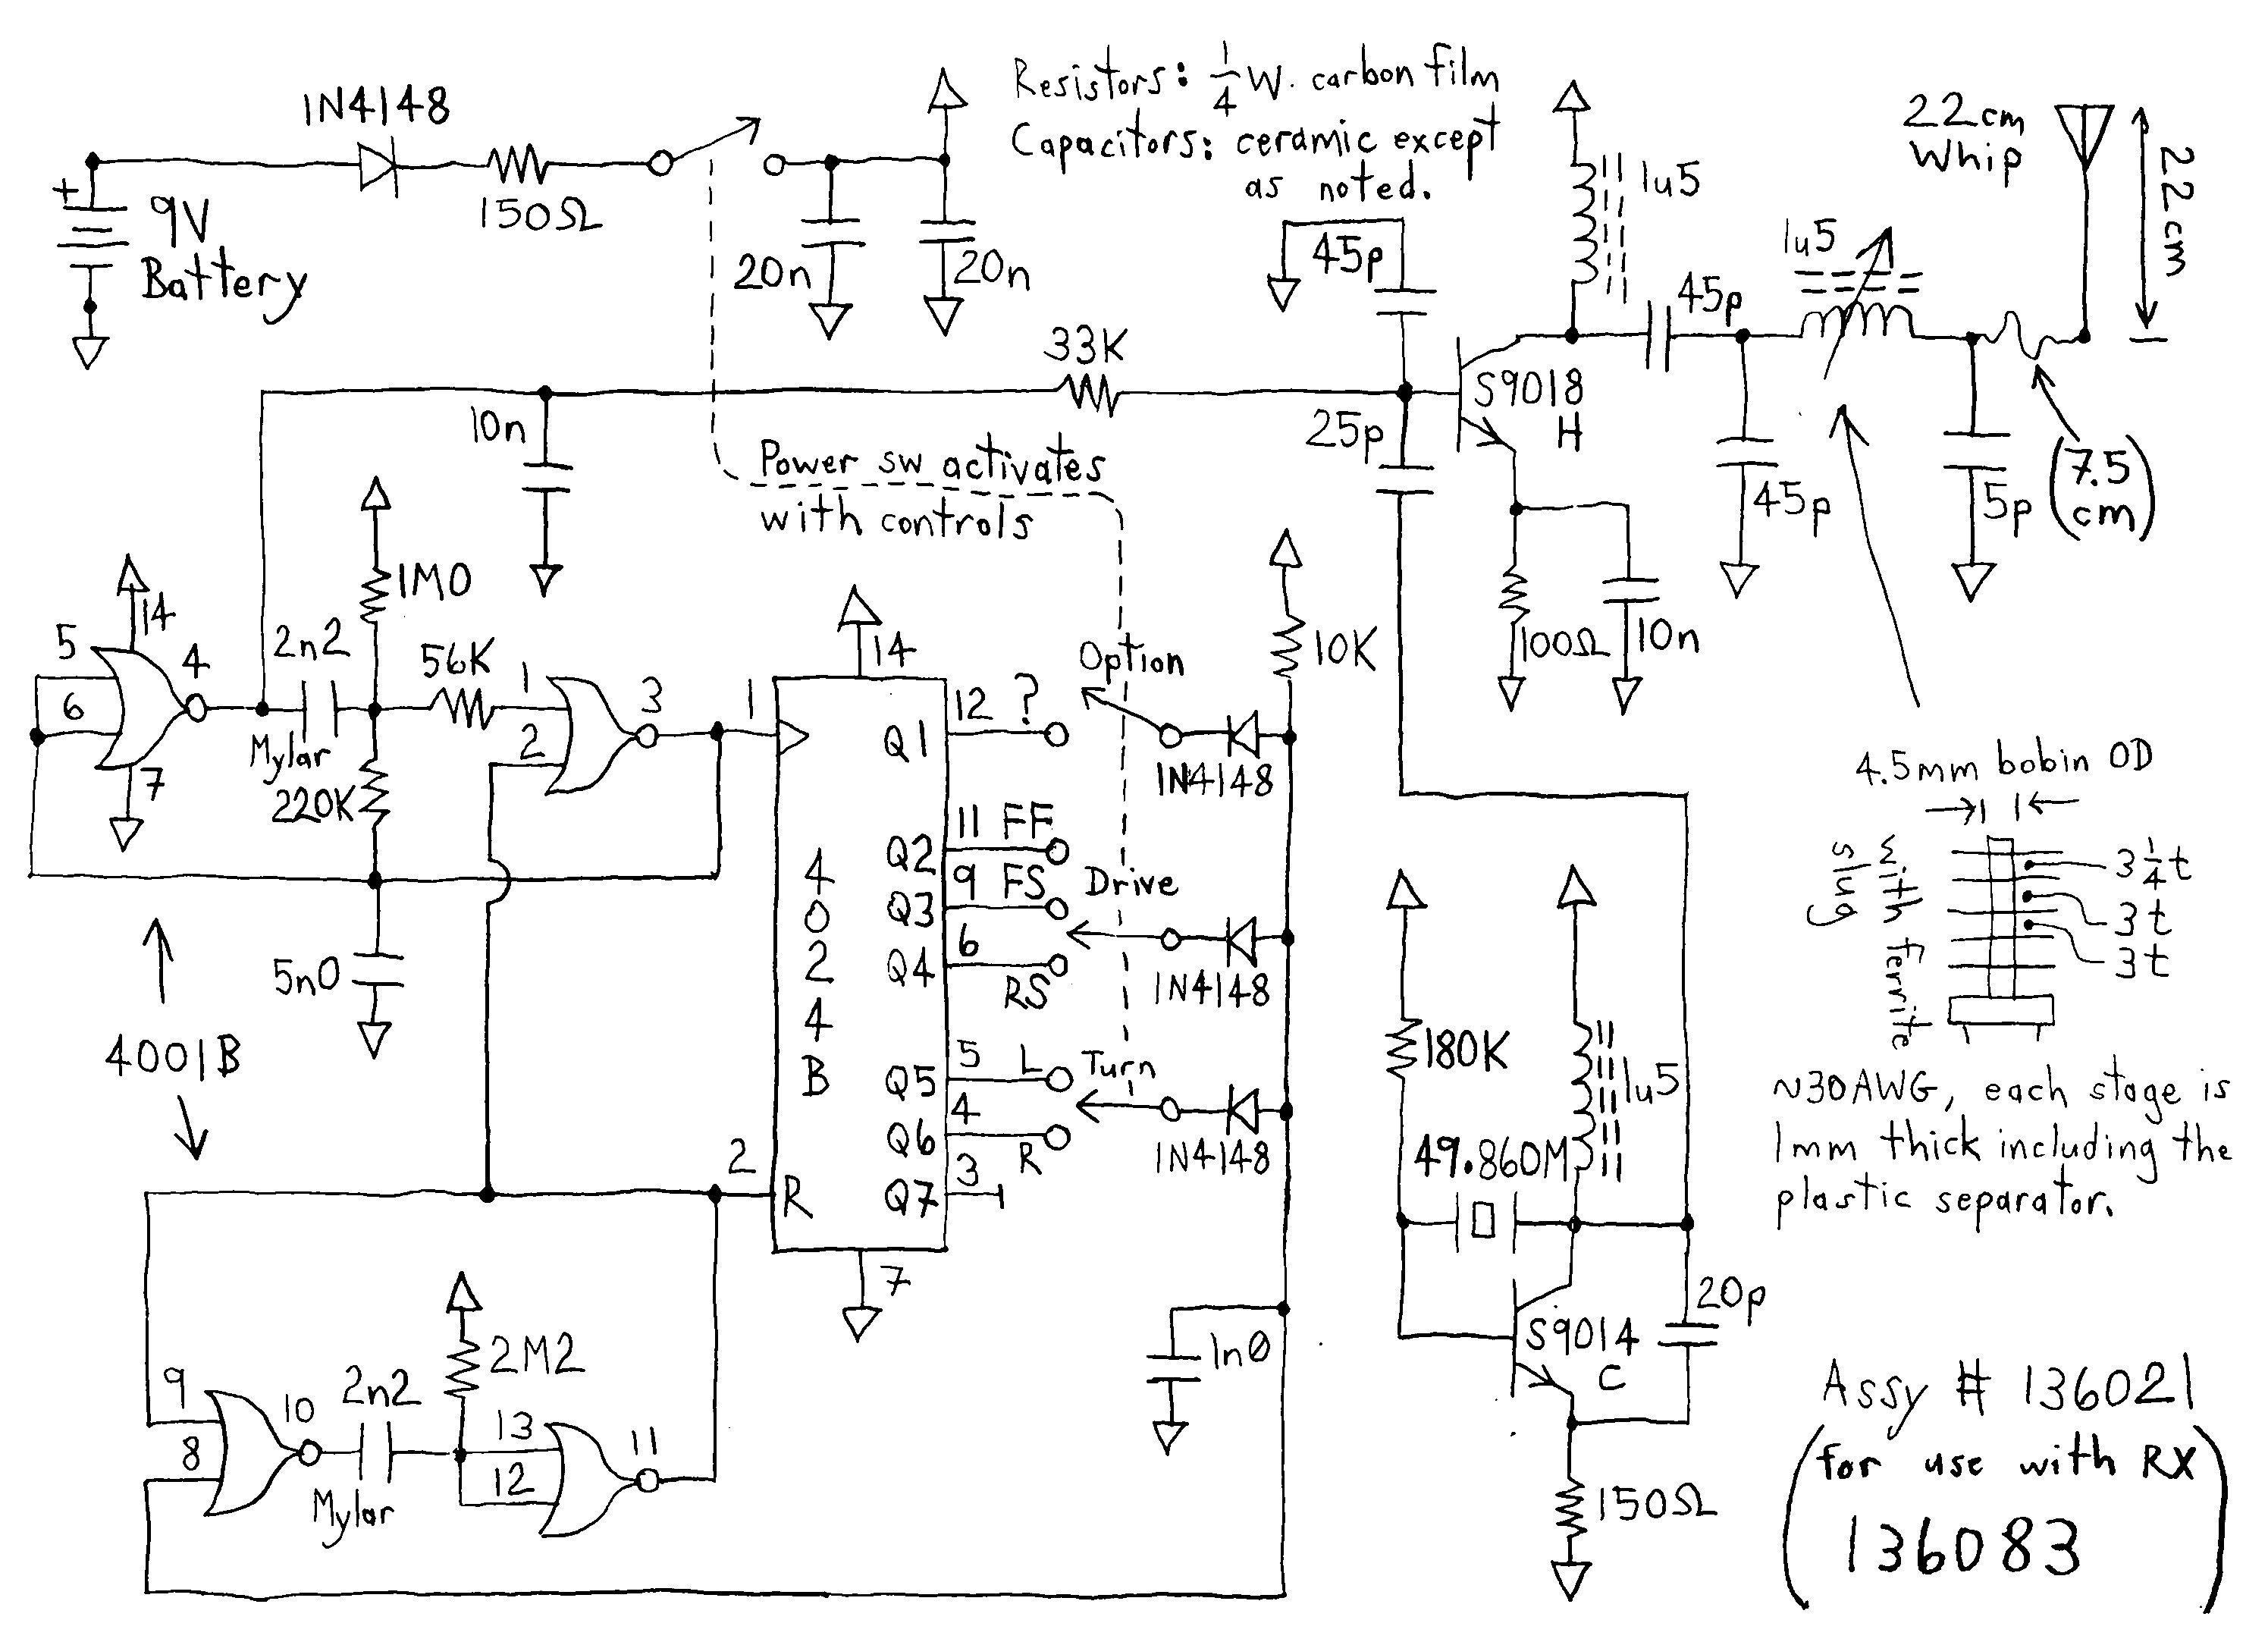 Remote Control Circuit Diagram For Toy Car Electrical Wiring Diagram Electrical Diagram Circuit Diagram